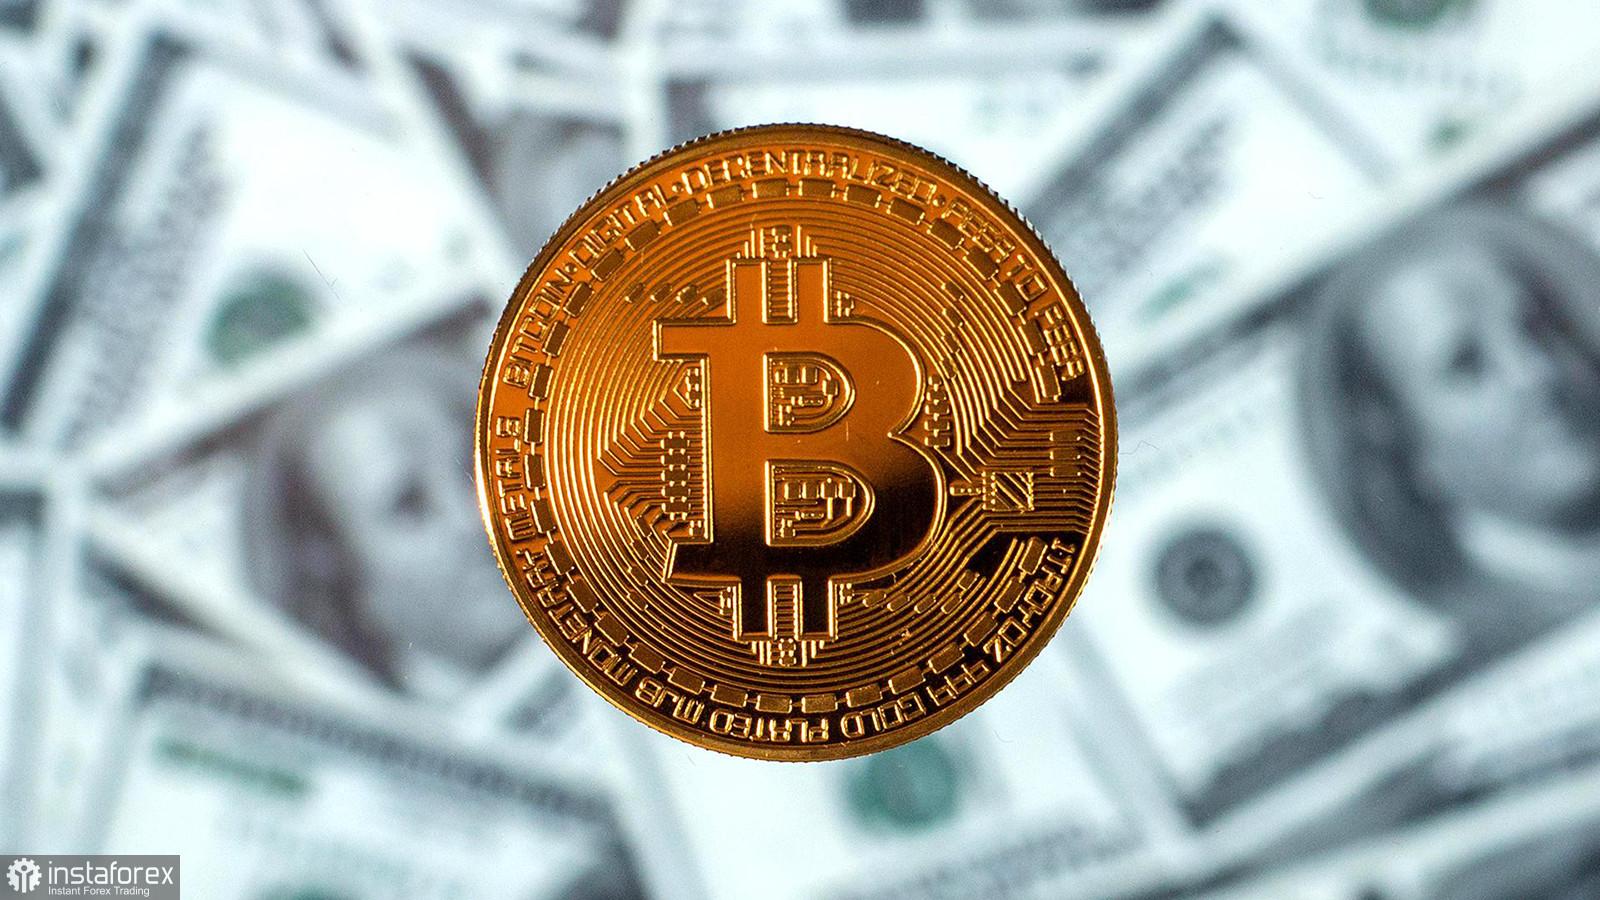 Jamie Dimon criticizes Bitcoin again